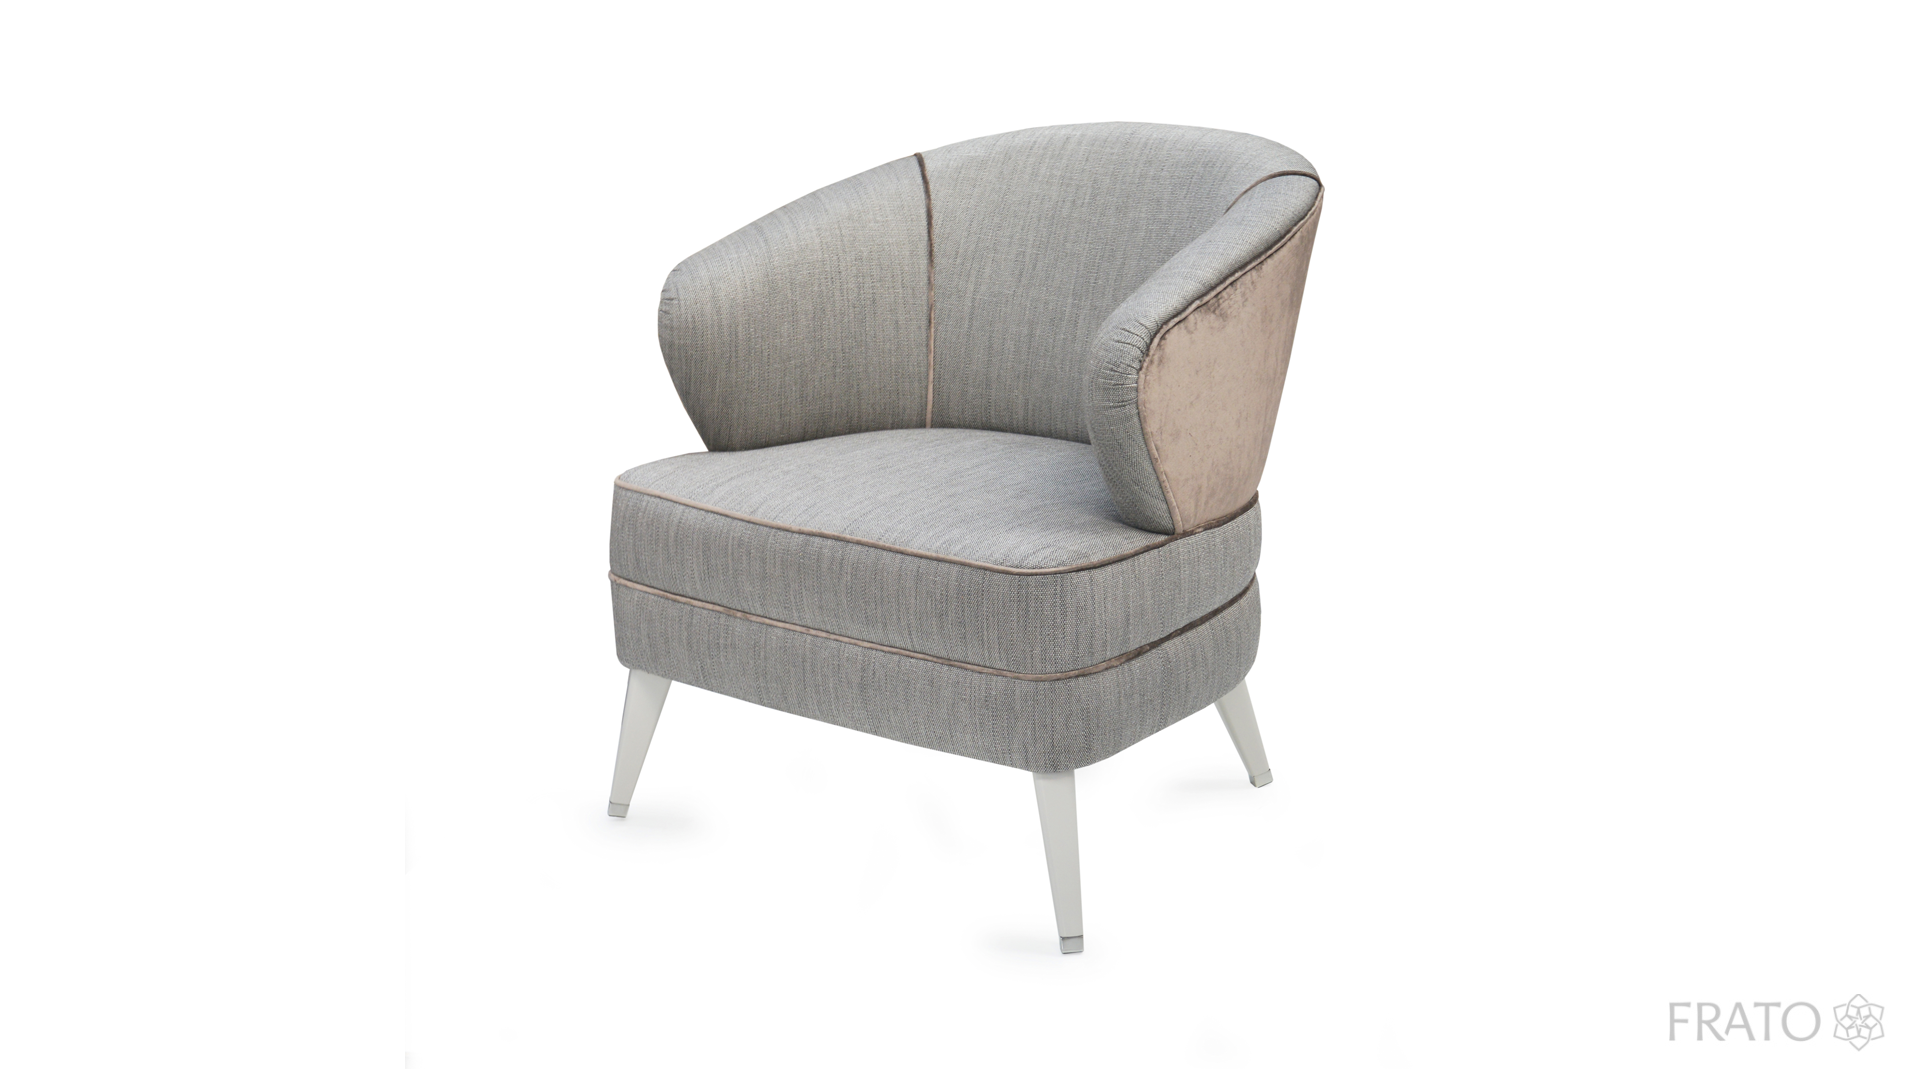 Dubai Living Room Upholstery Upholstered Chairs Sofa Chair